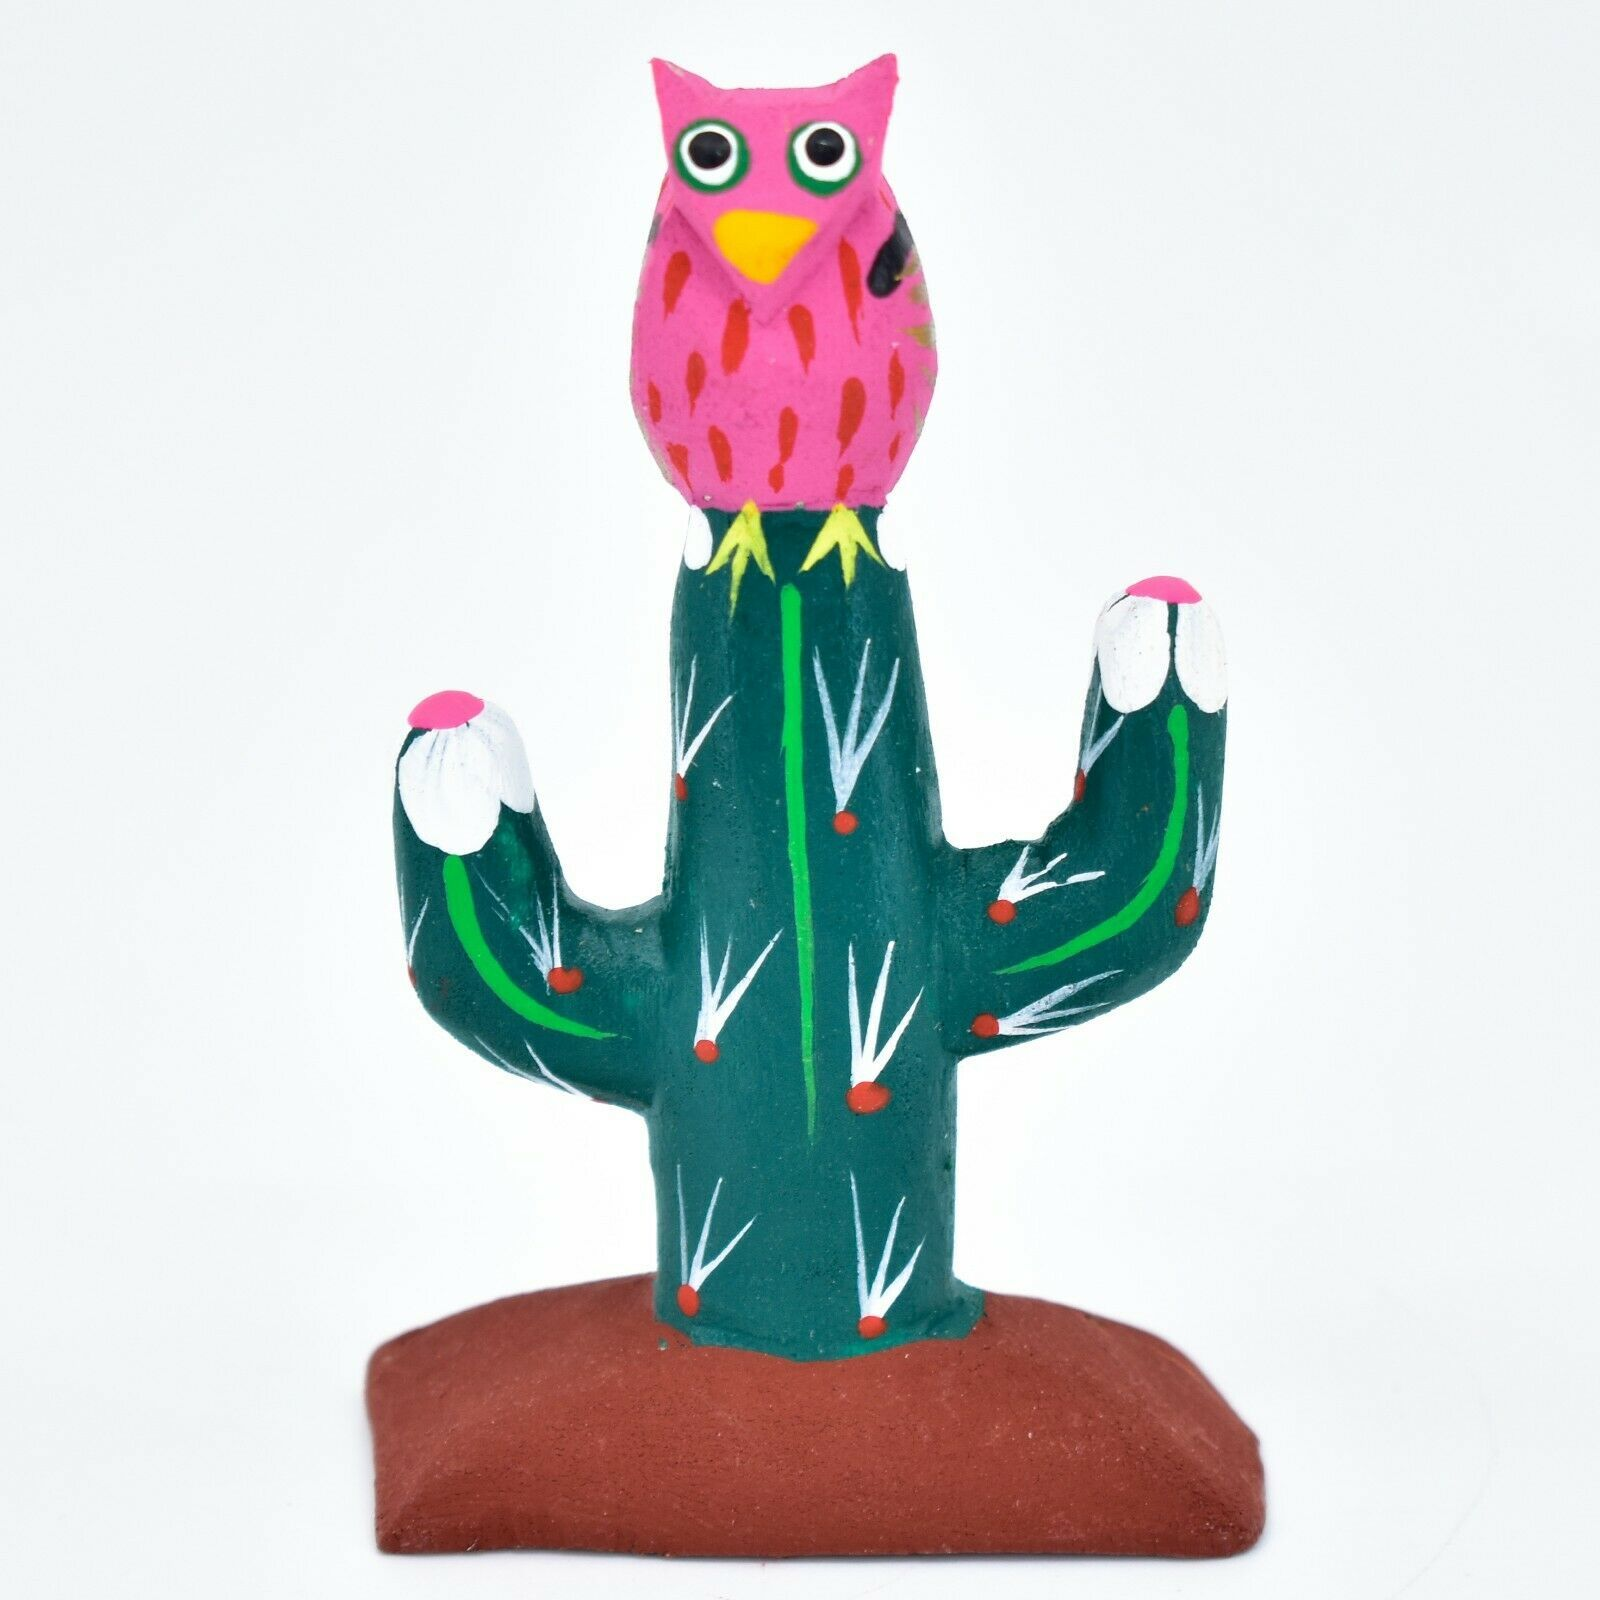 Handmade Alebrijes Oaxacan Wood Carved Painted Folk Art Owl w Cactus Figurine